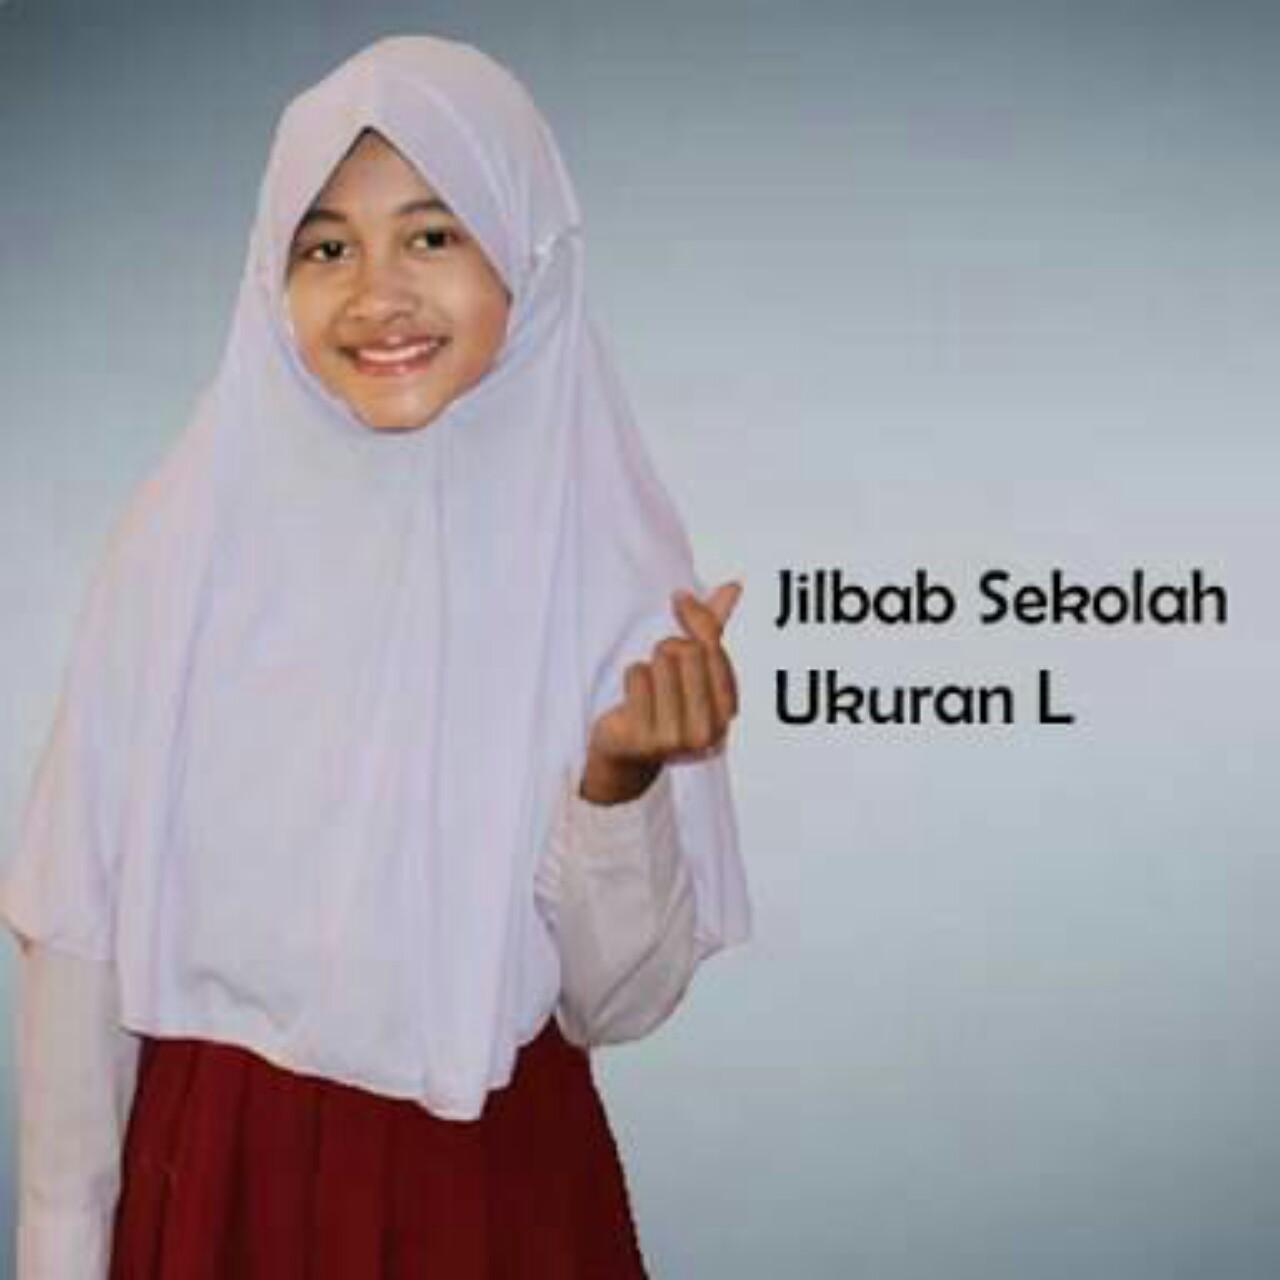 Jilbab anak sekolah ukuran L